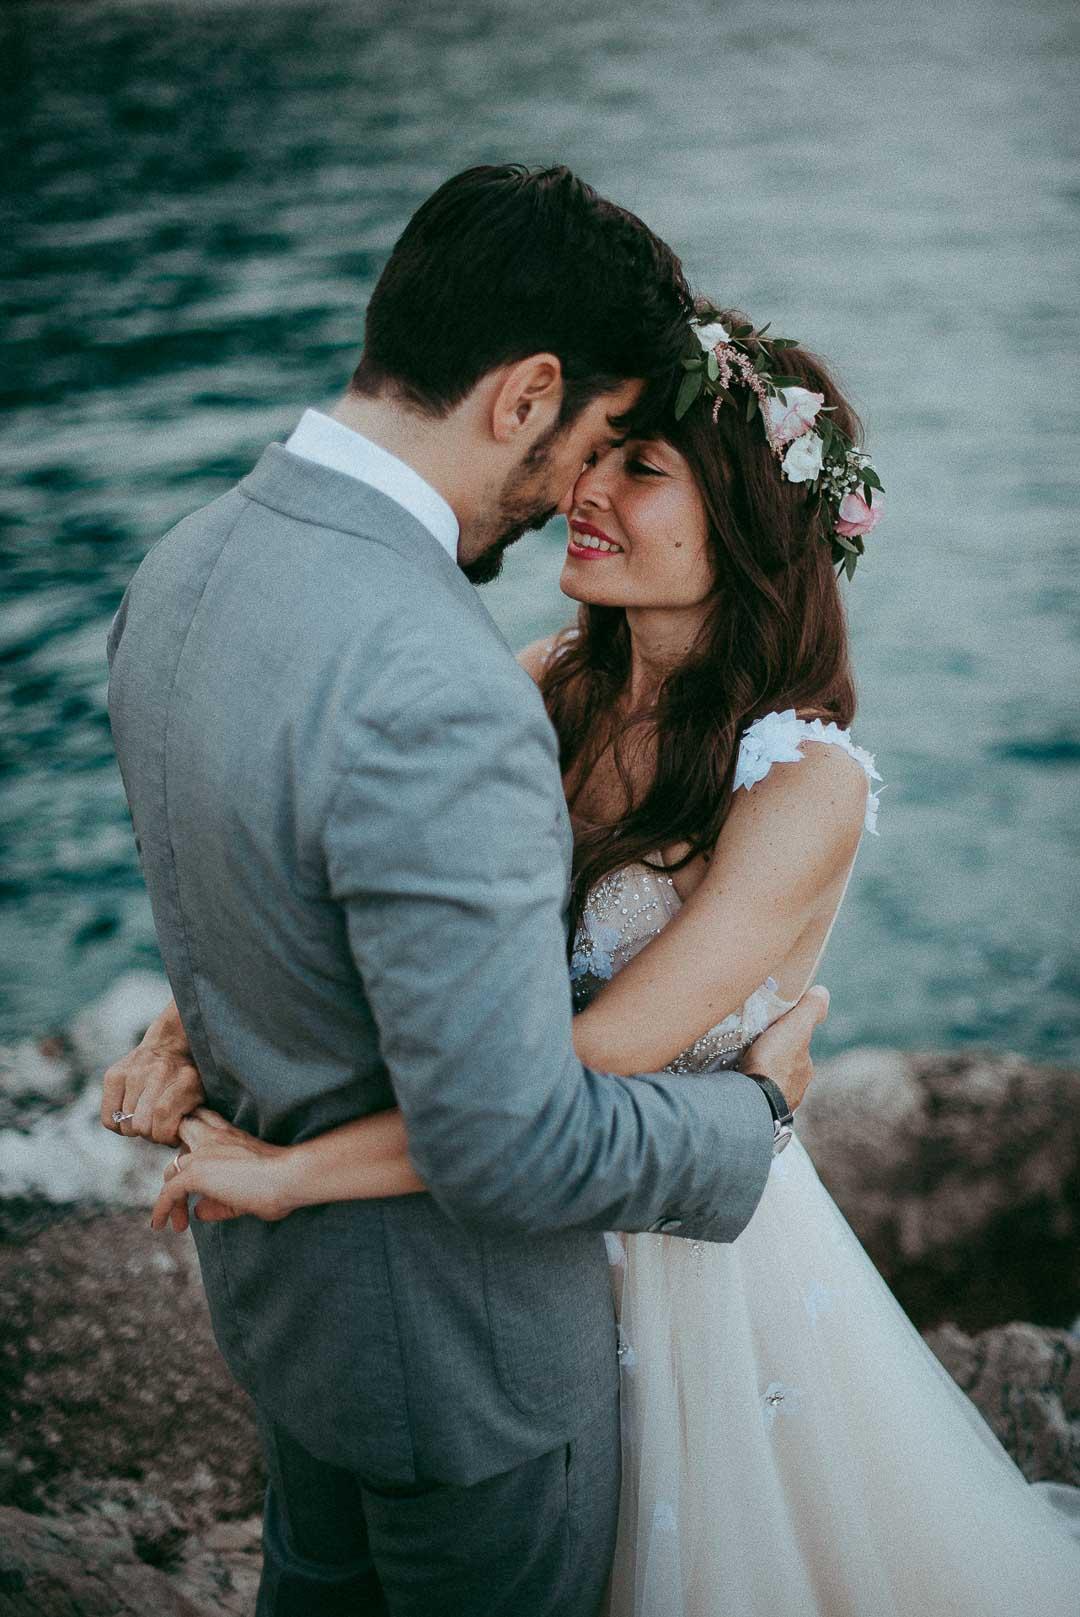 wedding-photographer-destination-fineart-bespoke-reportage-amalficoast-torrelacerniola-vivianeizzo-spazio46-81